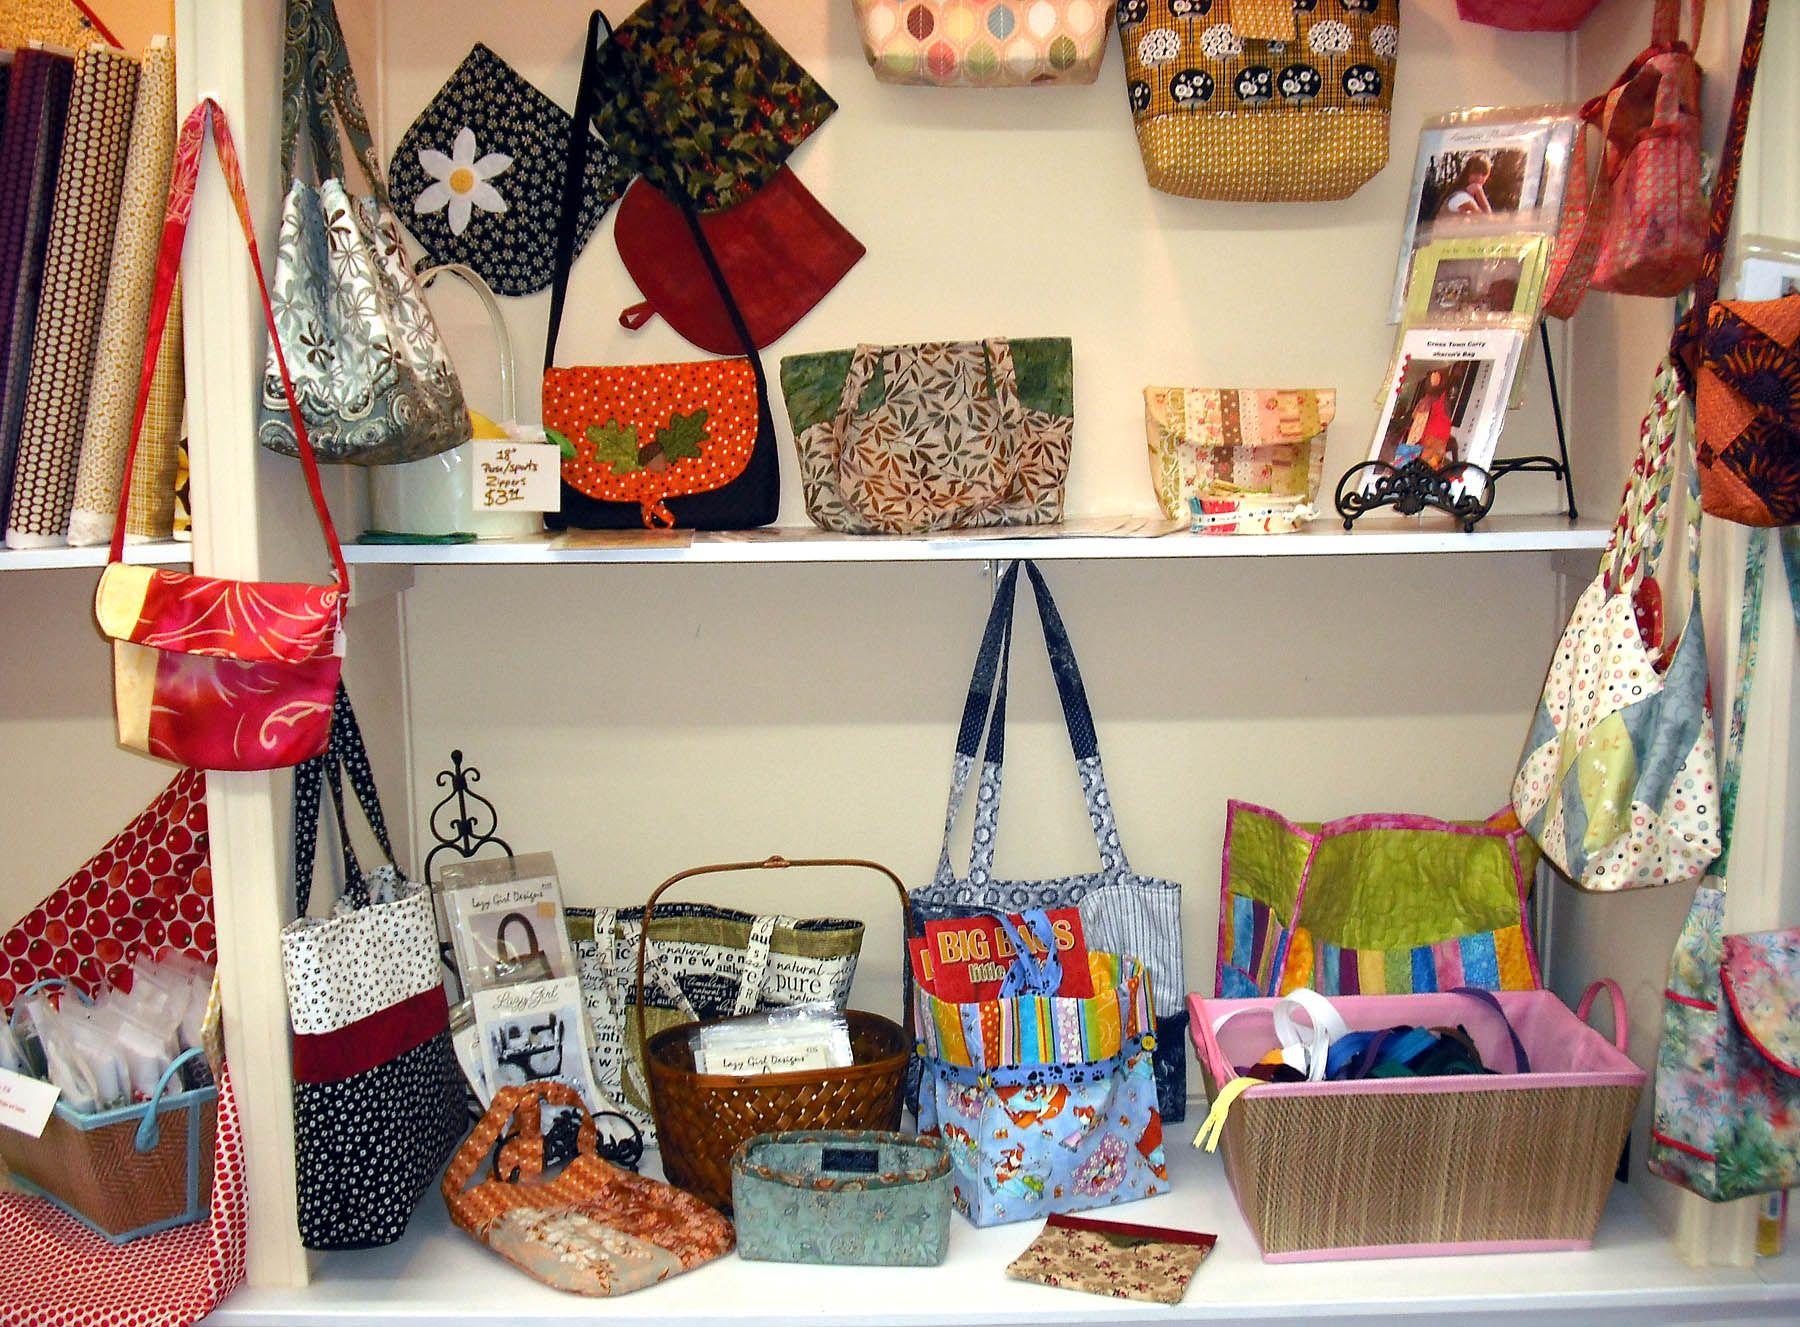 quilt shop display ideas - Google Search   Quilt Shoppe   Pinterest : quilt shop search - Adamdwight.com